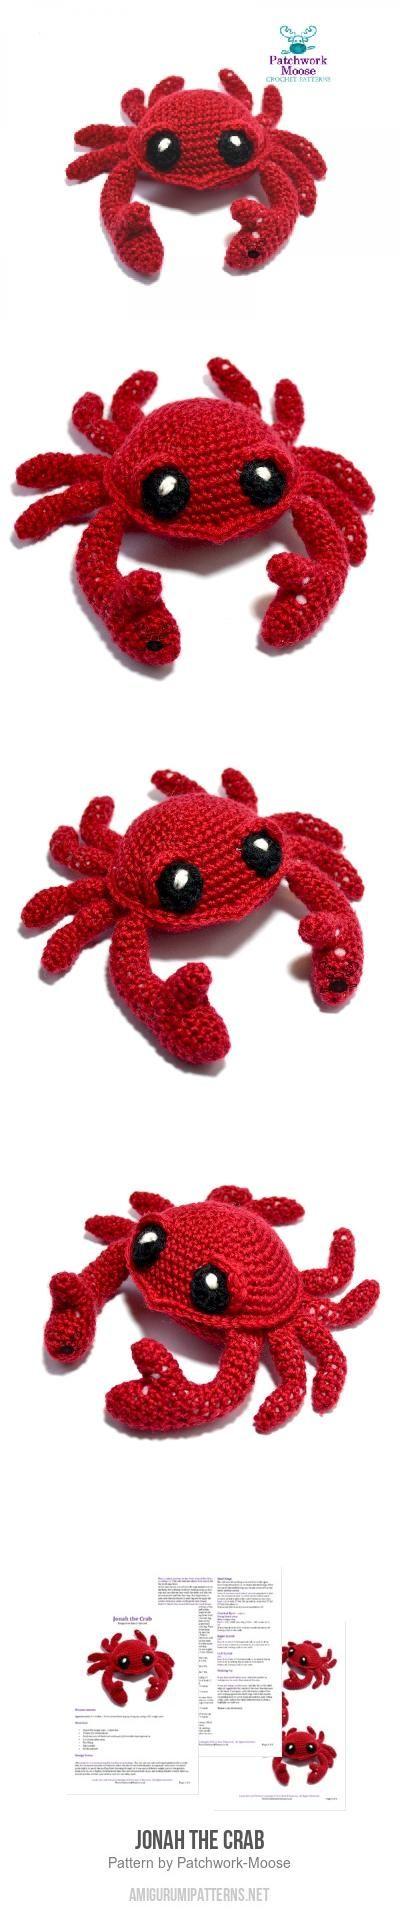 Jonah the Crab amigurumi pattern